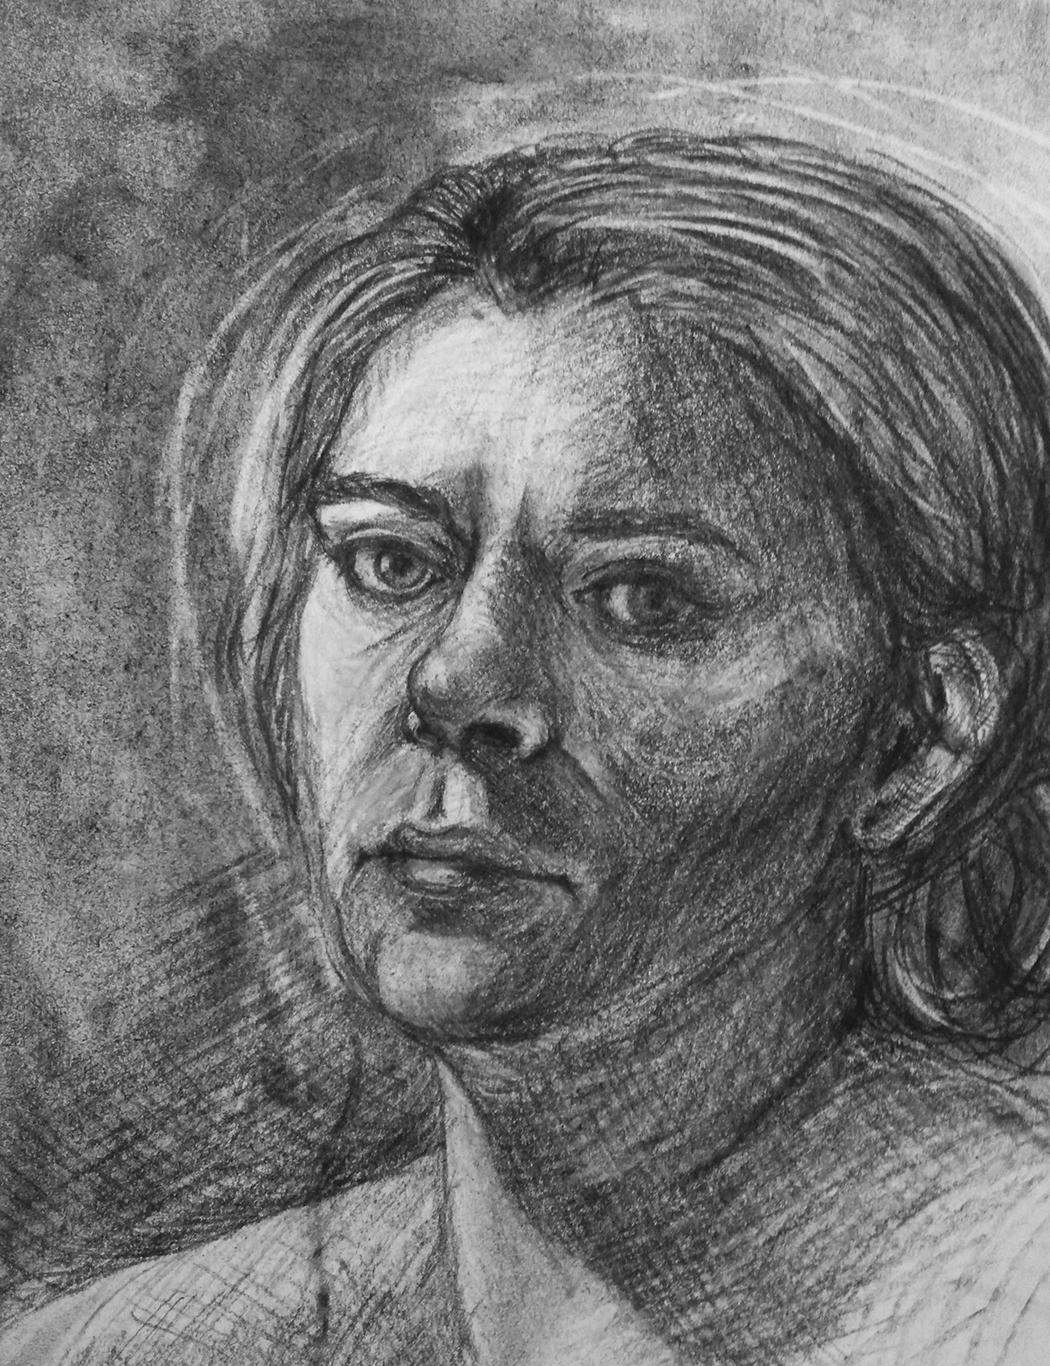 Charcoal Self-Portrait Drawing, Nikoletta Theodoropoulou